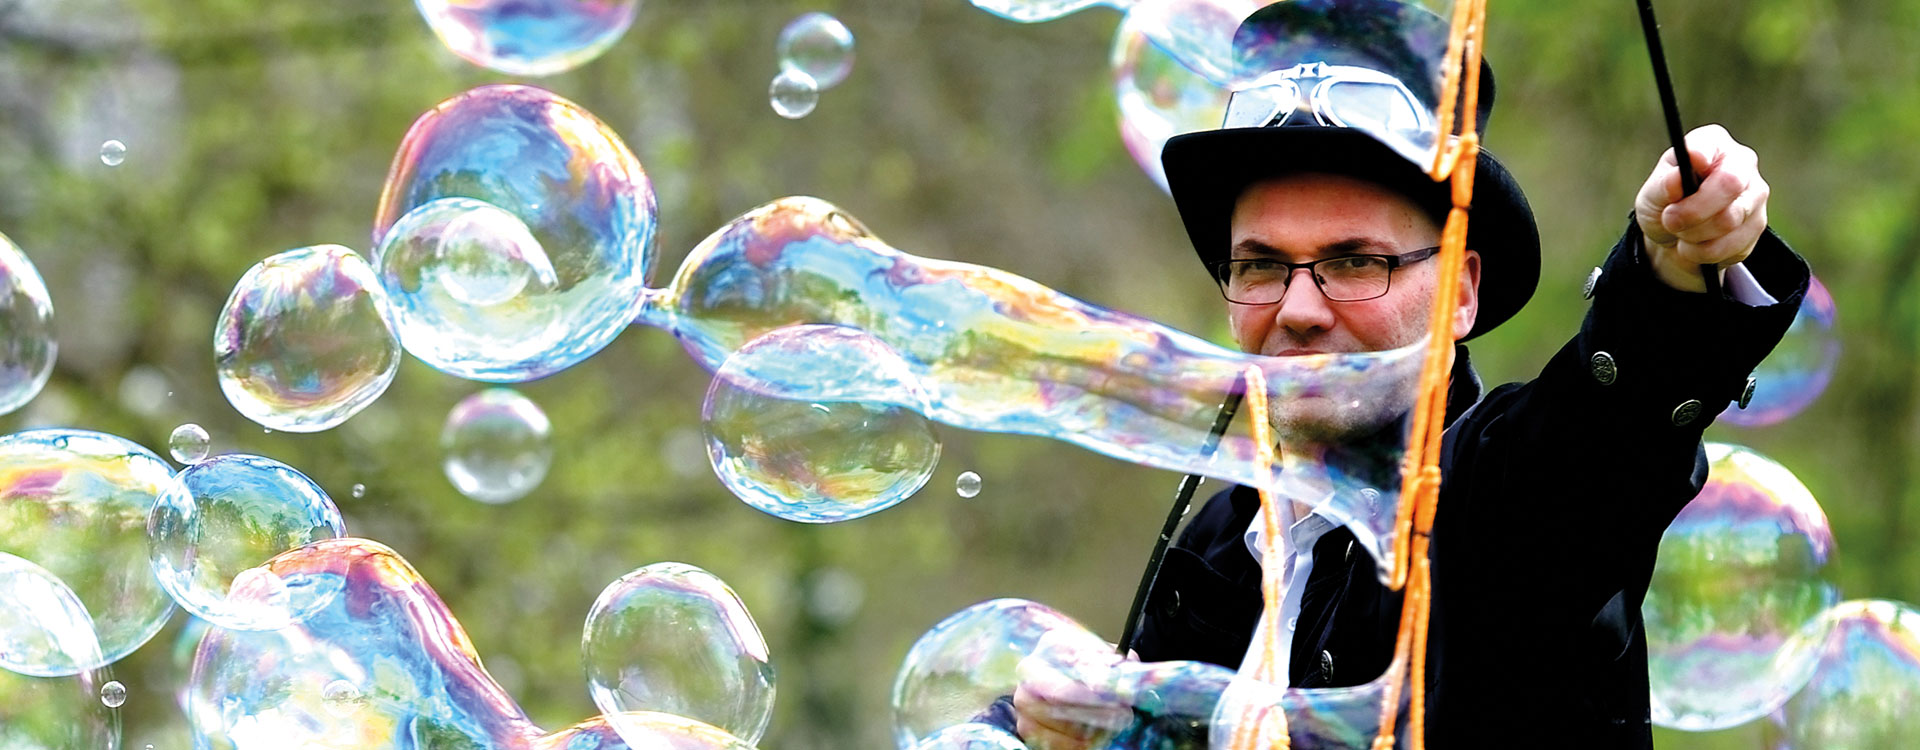 bulles geantes